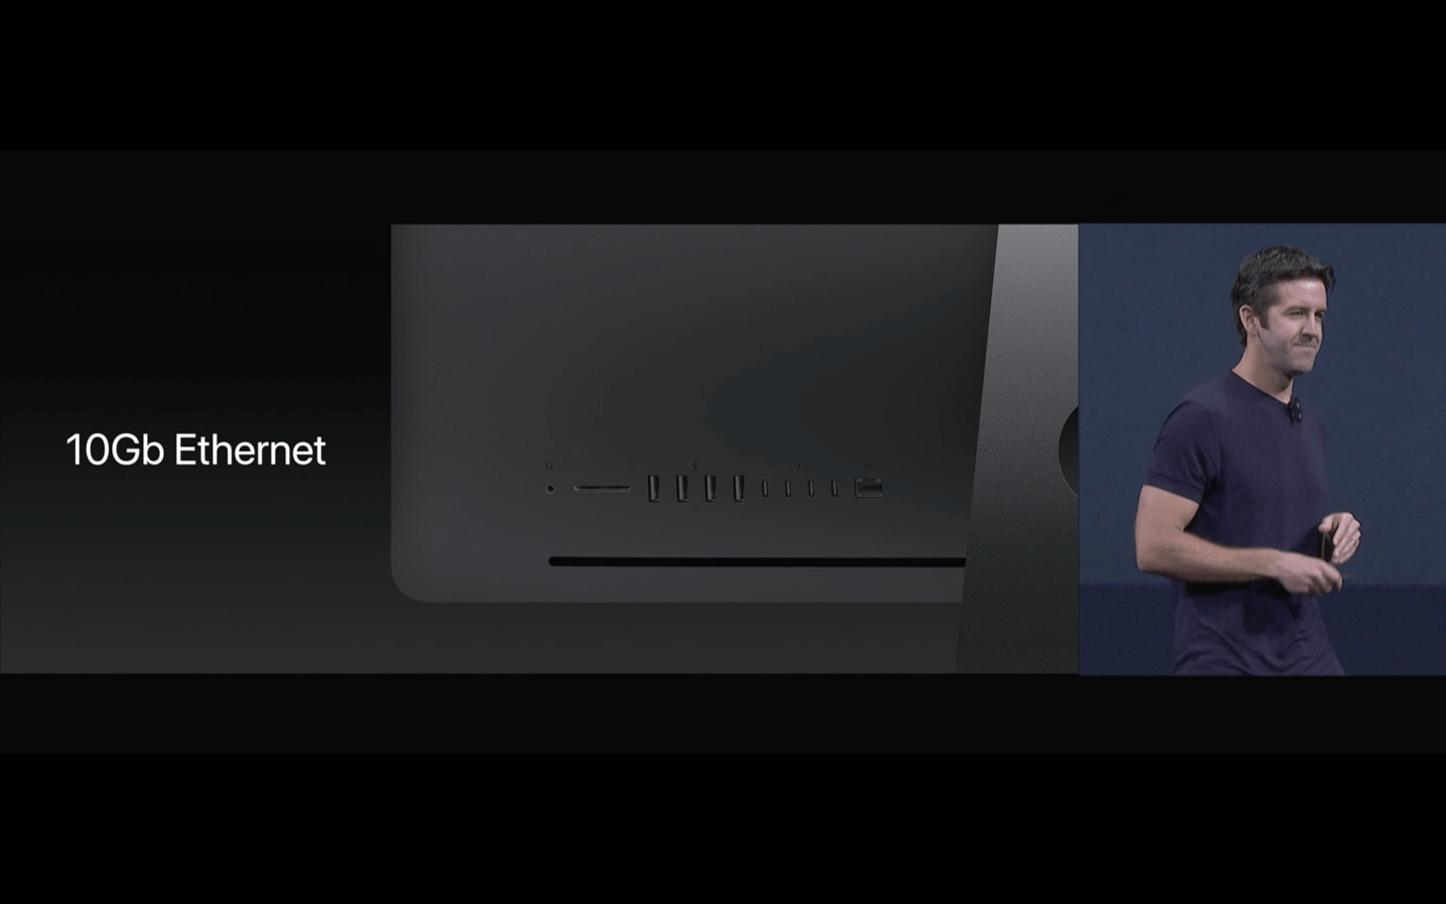 iMac-Pro-2017-WWDC17-21.png